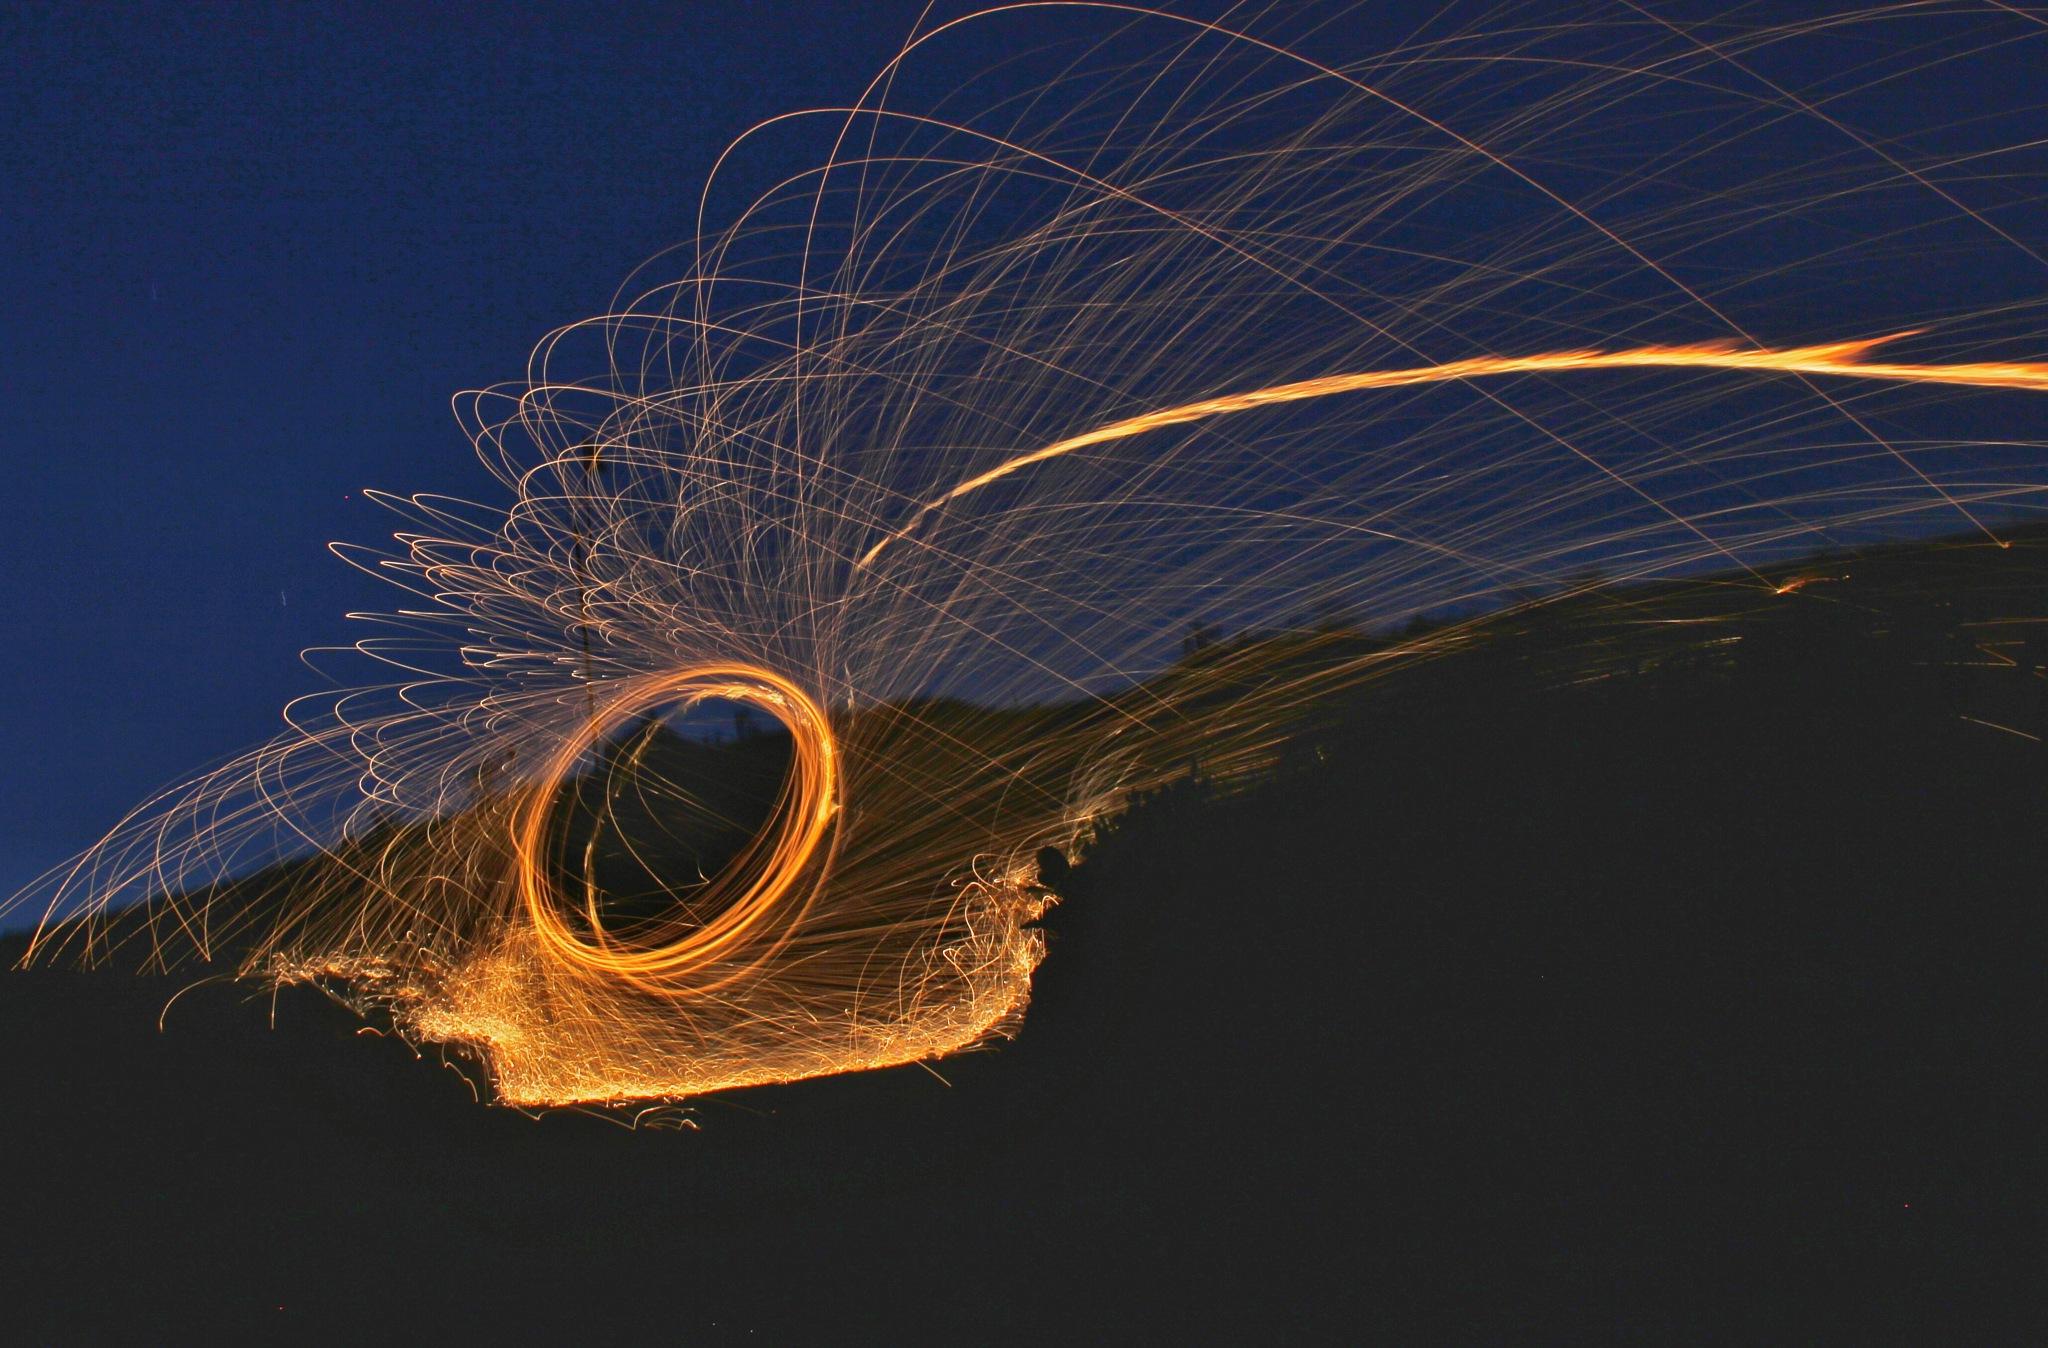 Firewool by Nirav Mehta